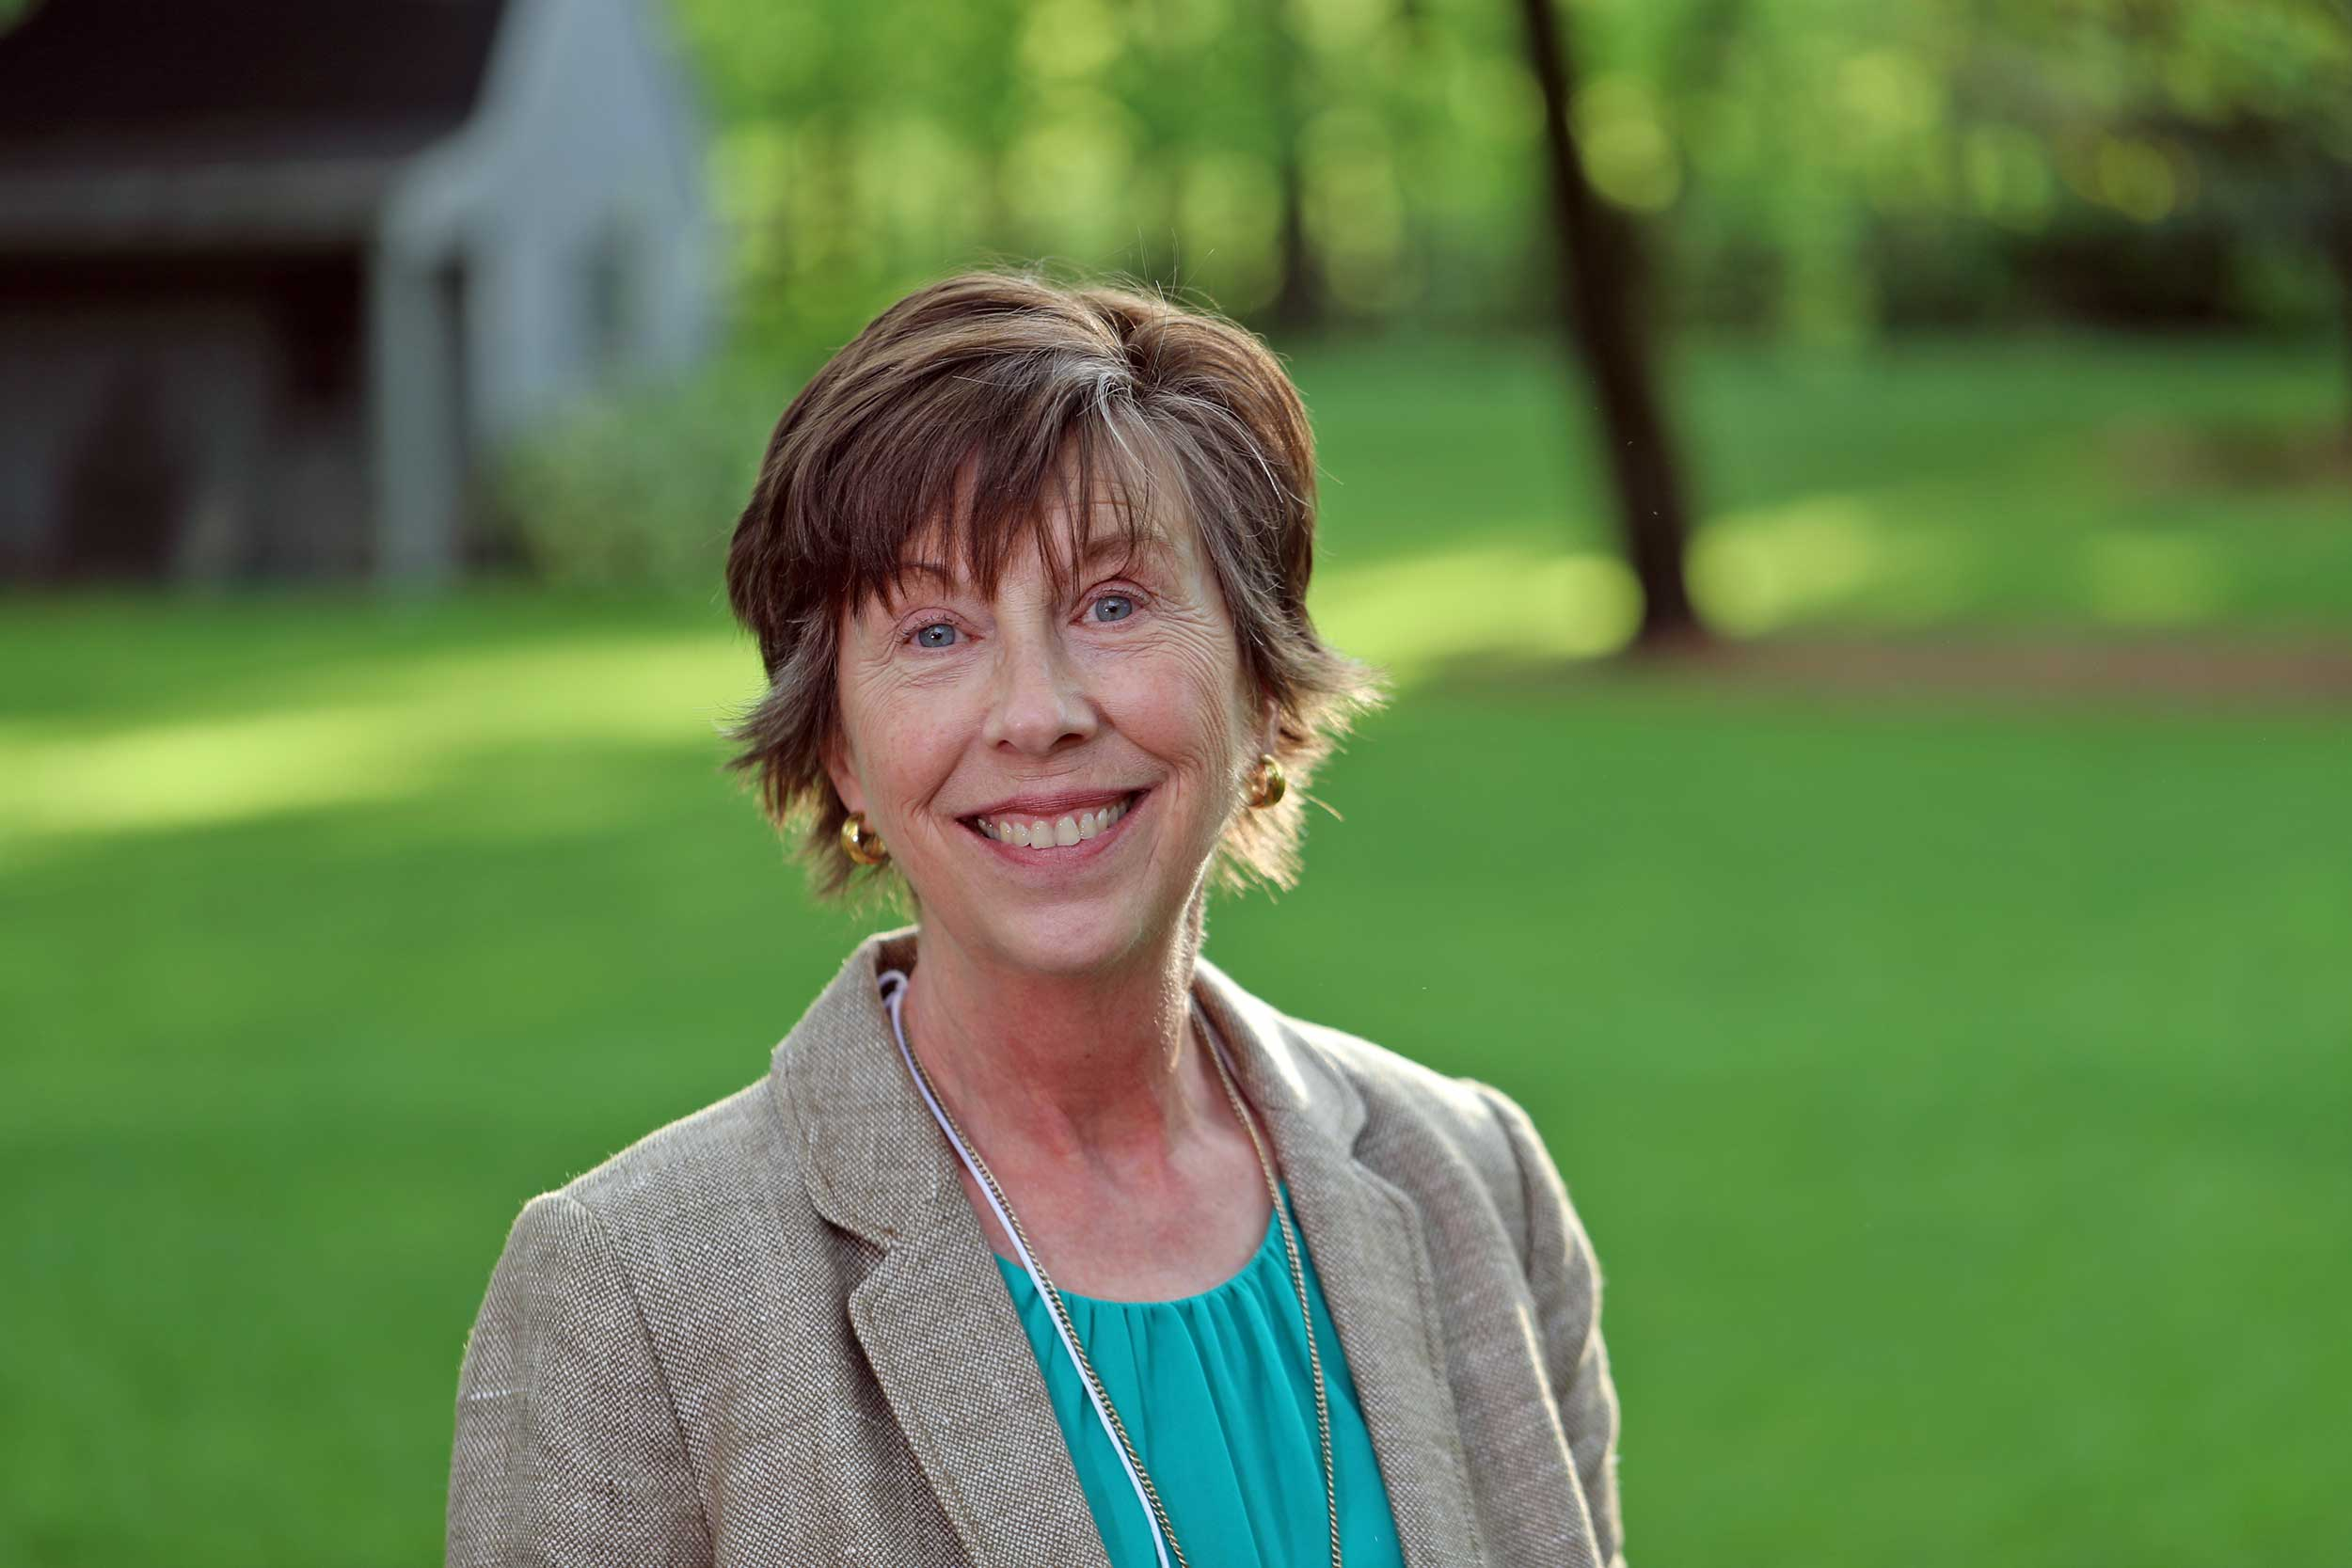 Chief Financial Officer, Linda Patrick